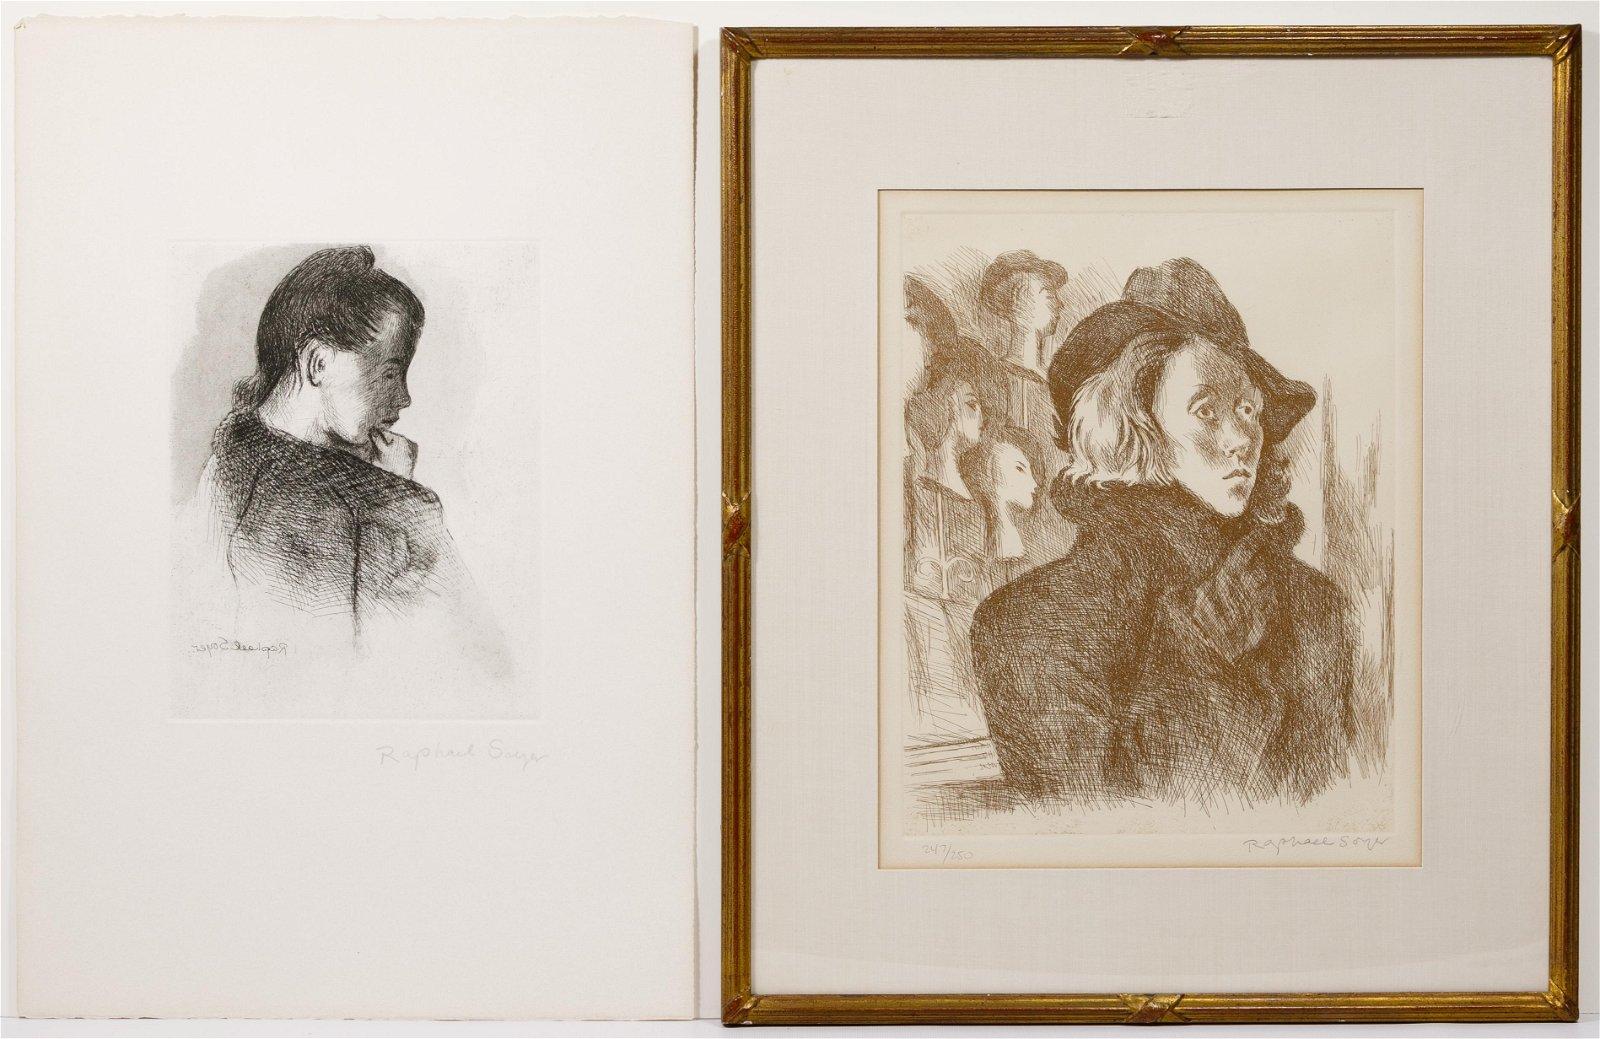 Raphael Soyer (Russian / American, 1899-1987) Etchings